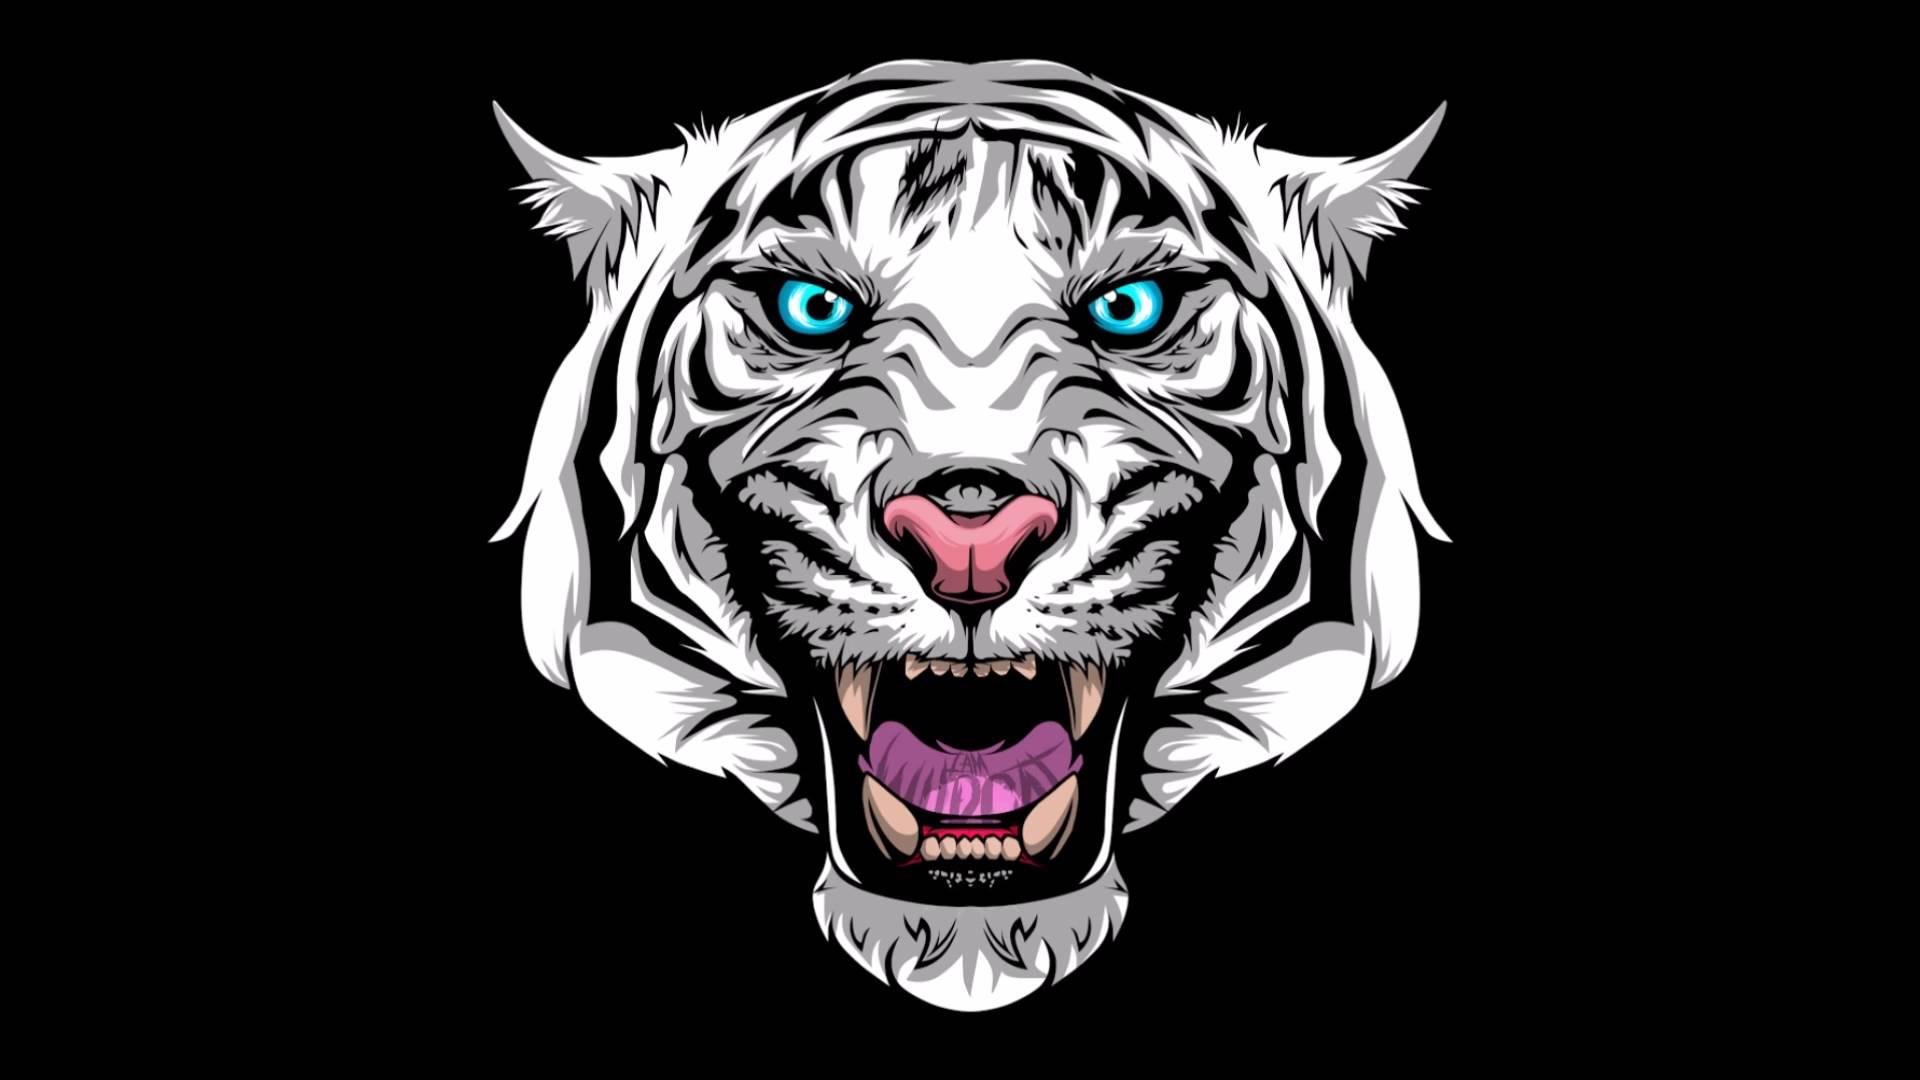 I am wildcat Logos.